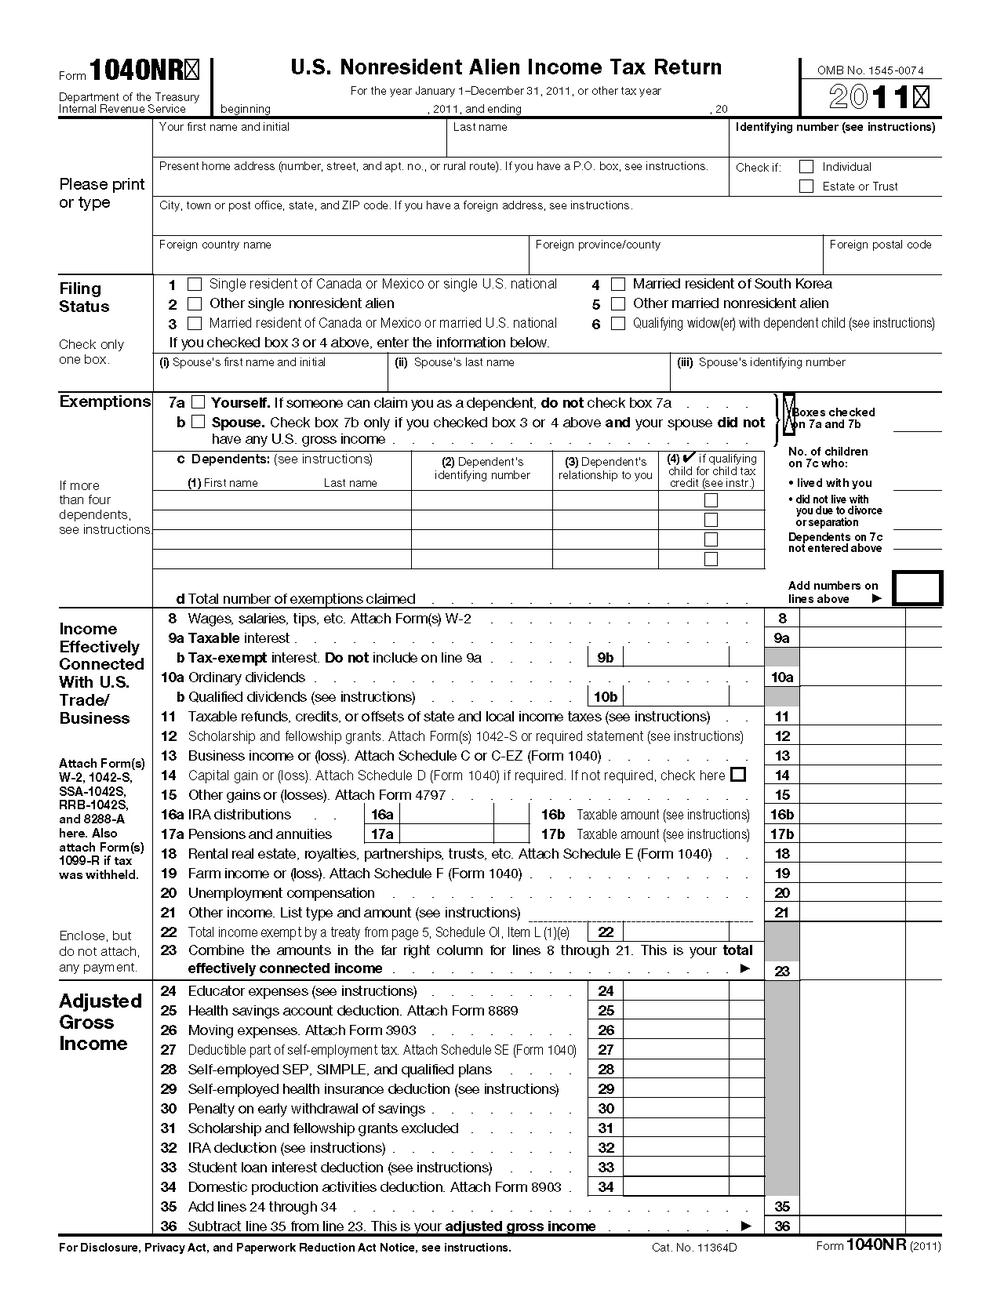 Federal Tax Return Form 1040 Mailing Address